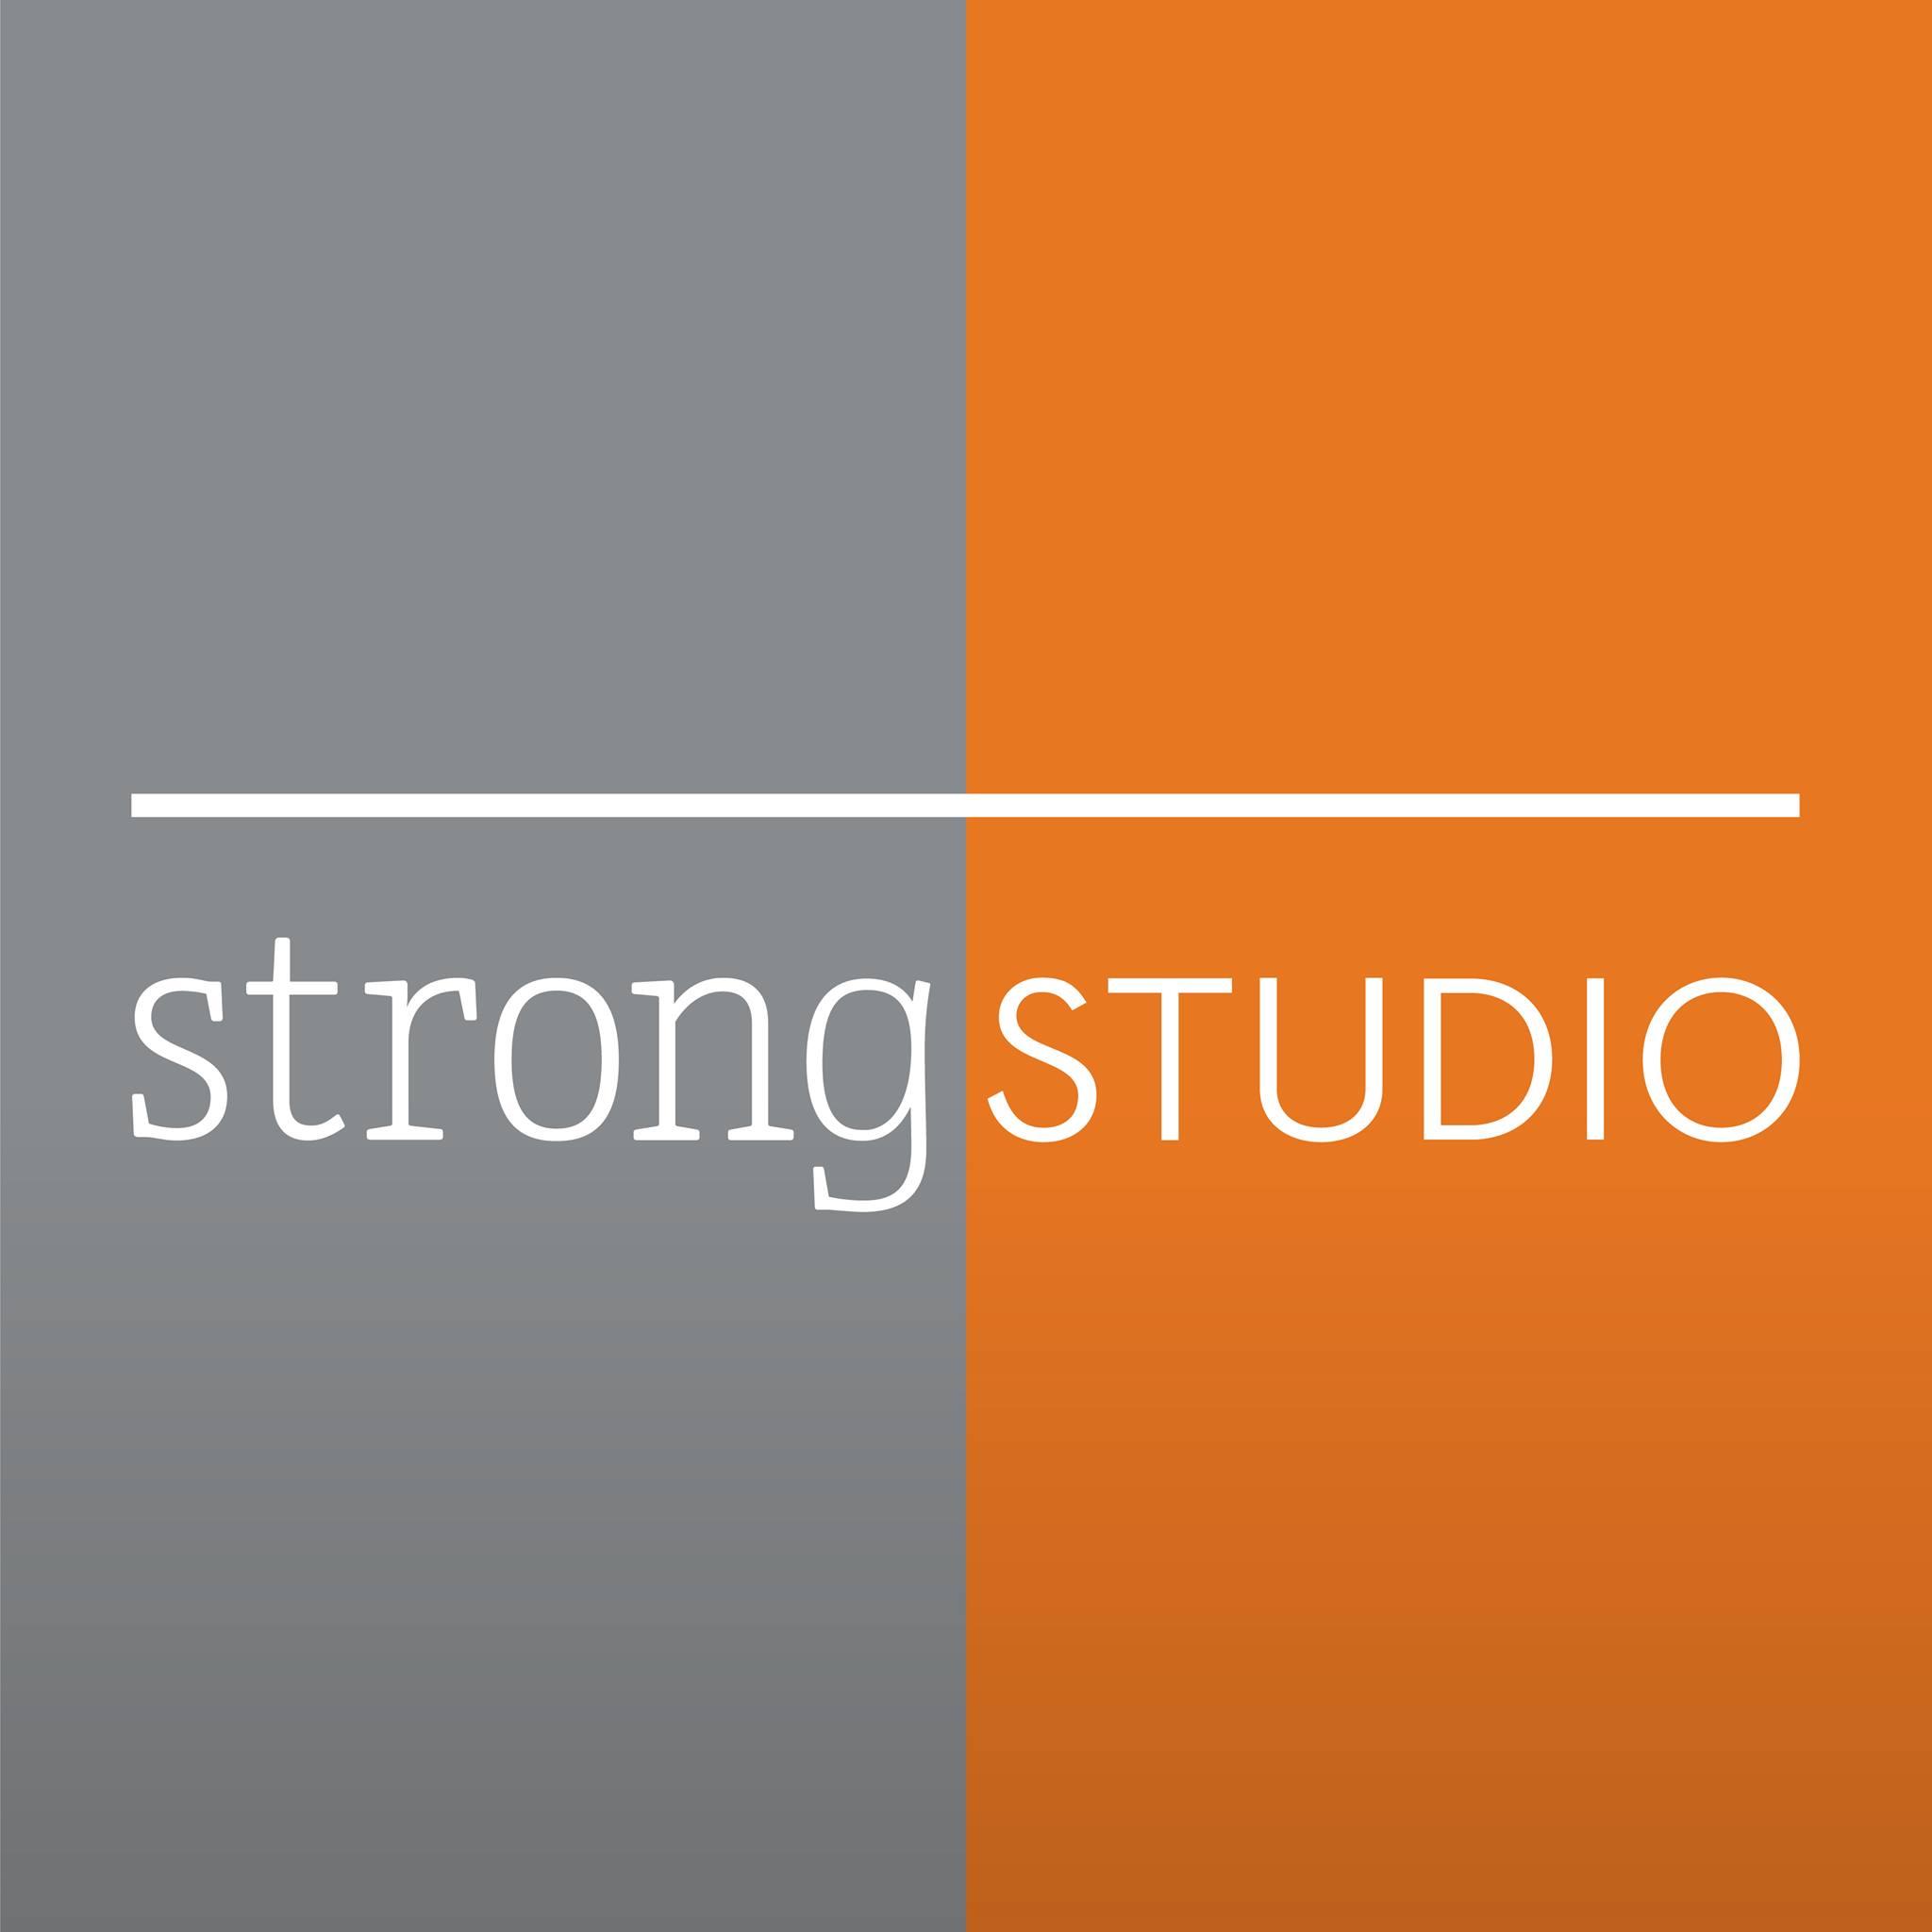 Strong Studio on LogoLounge